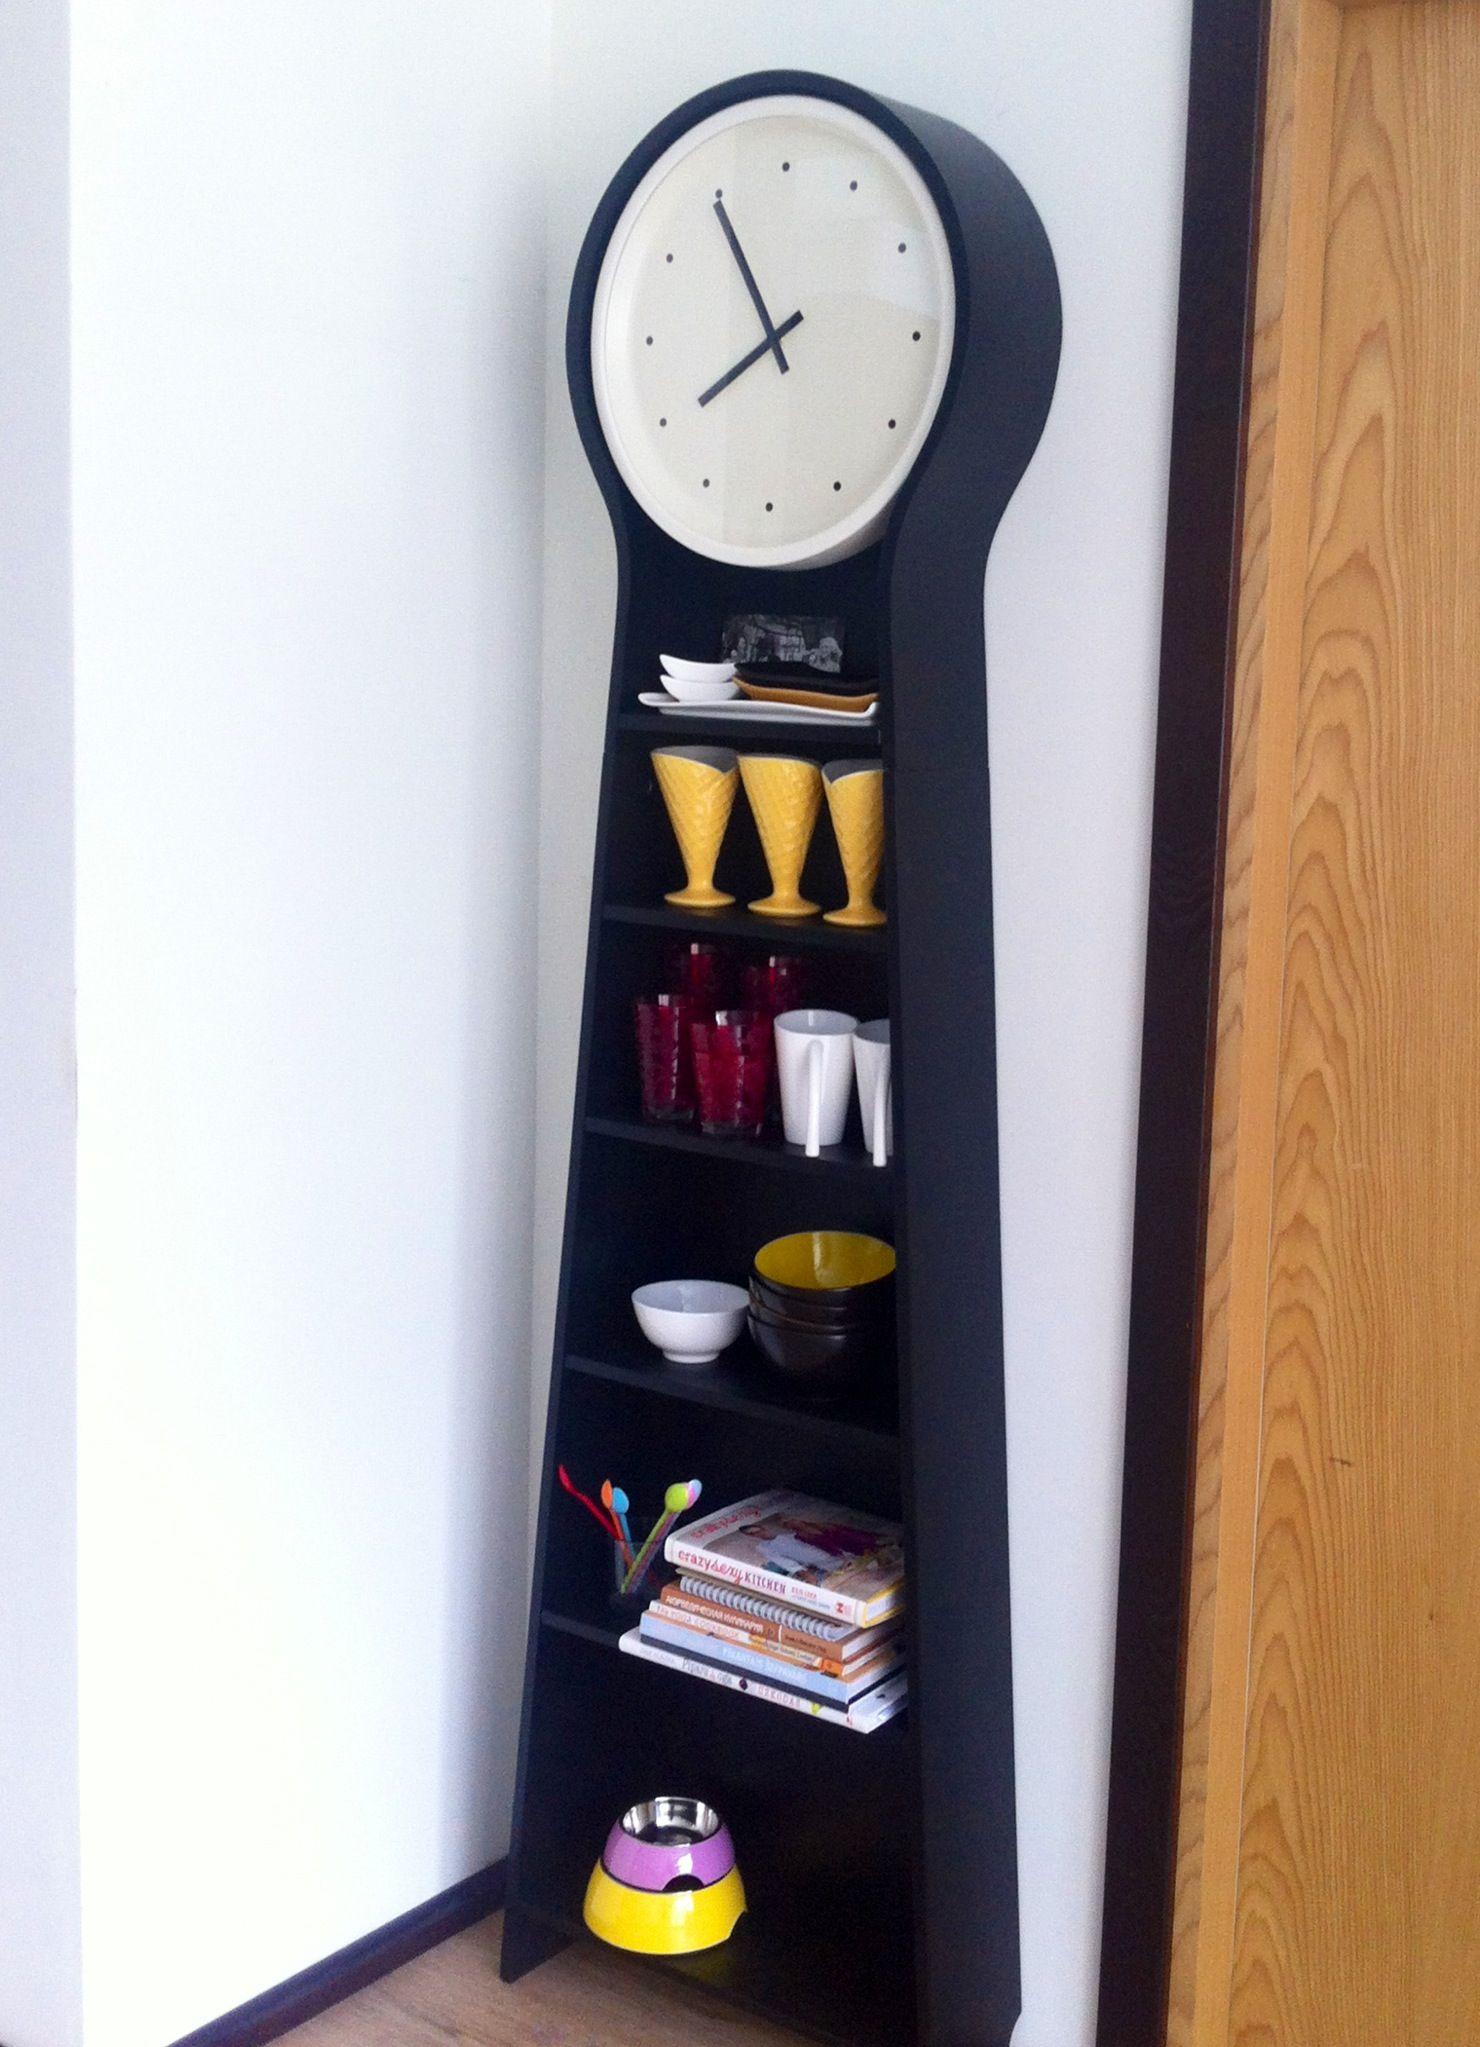 Ikea PS Pendel in the kitchen corner